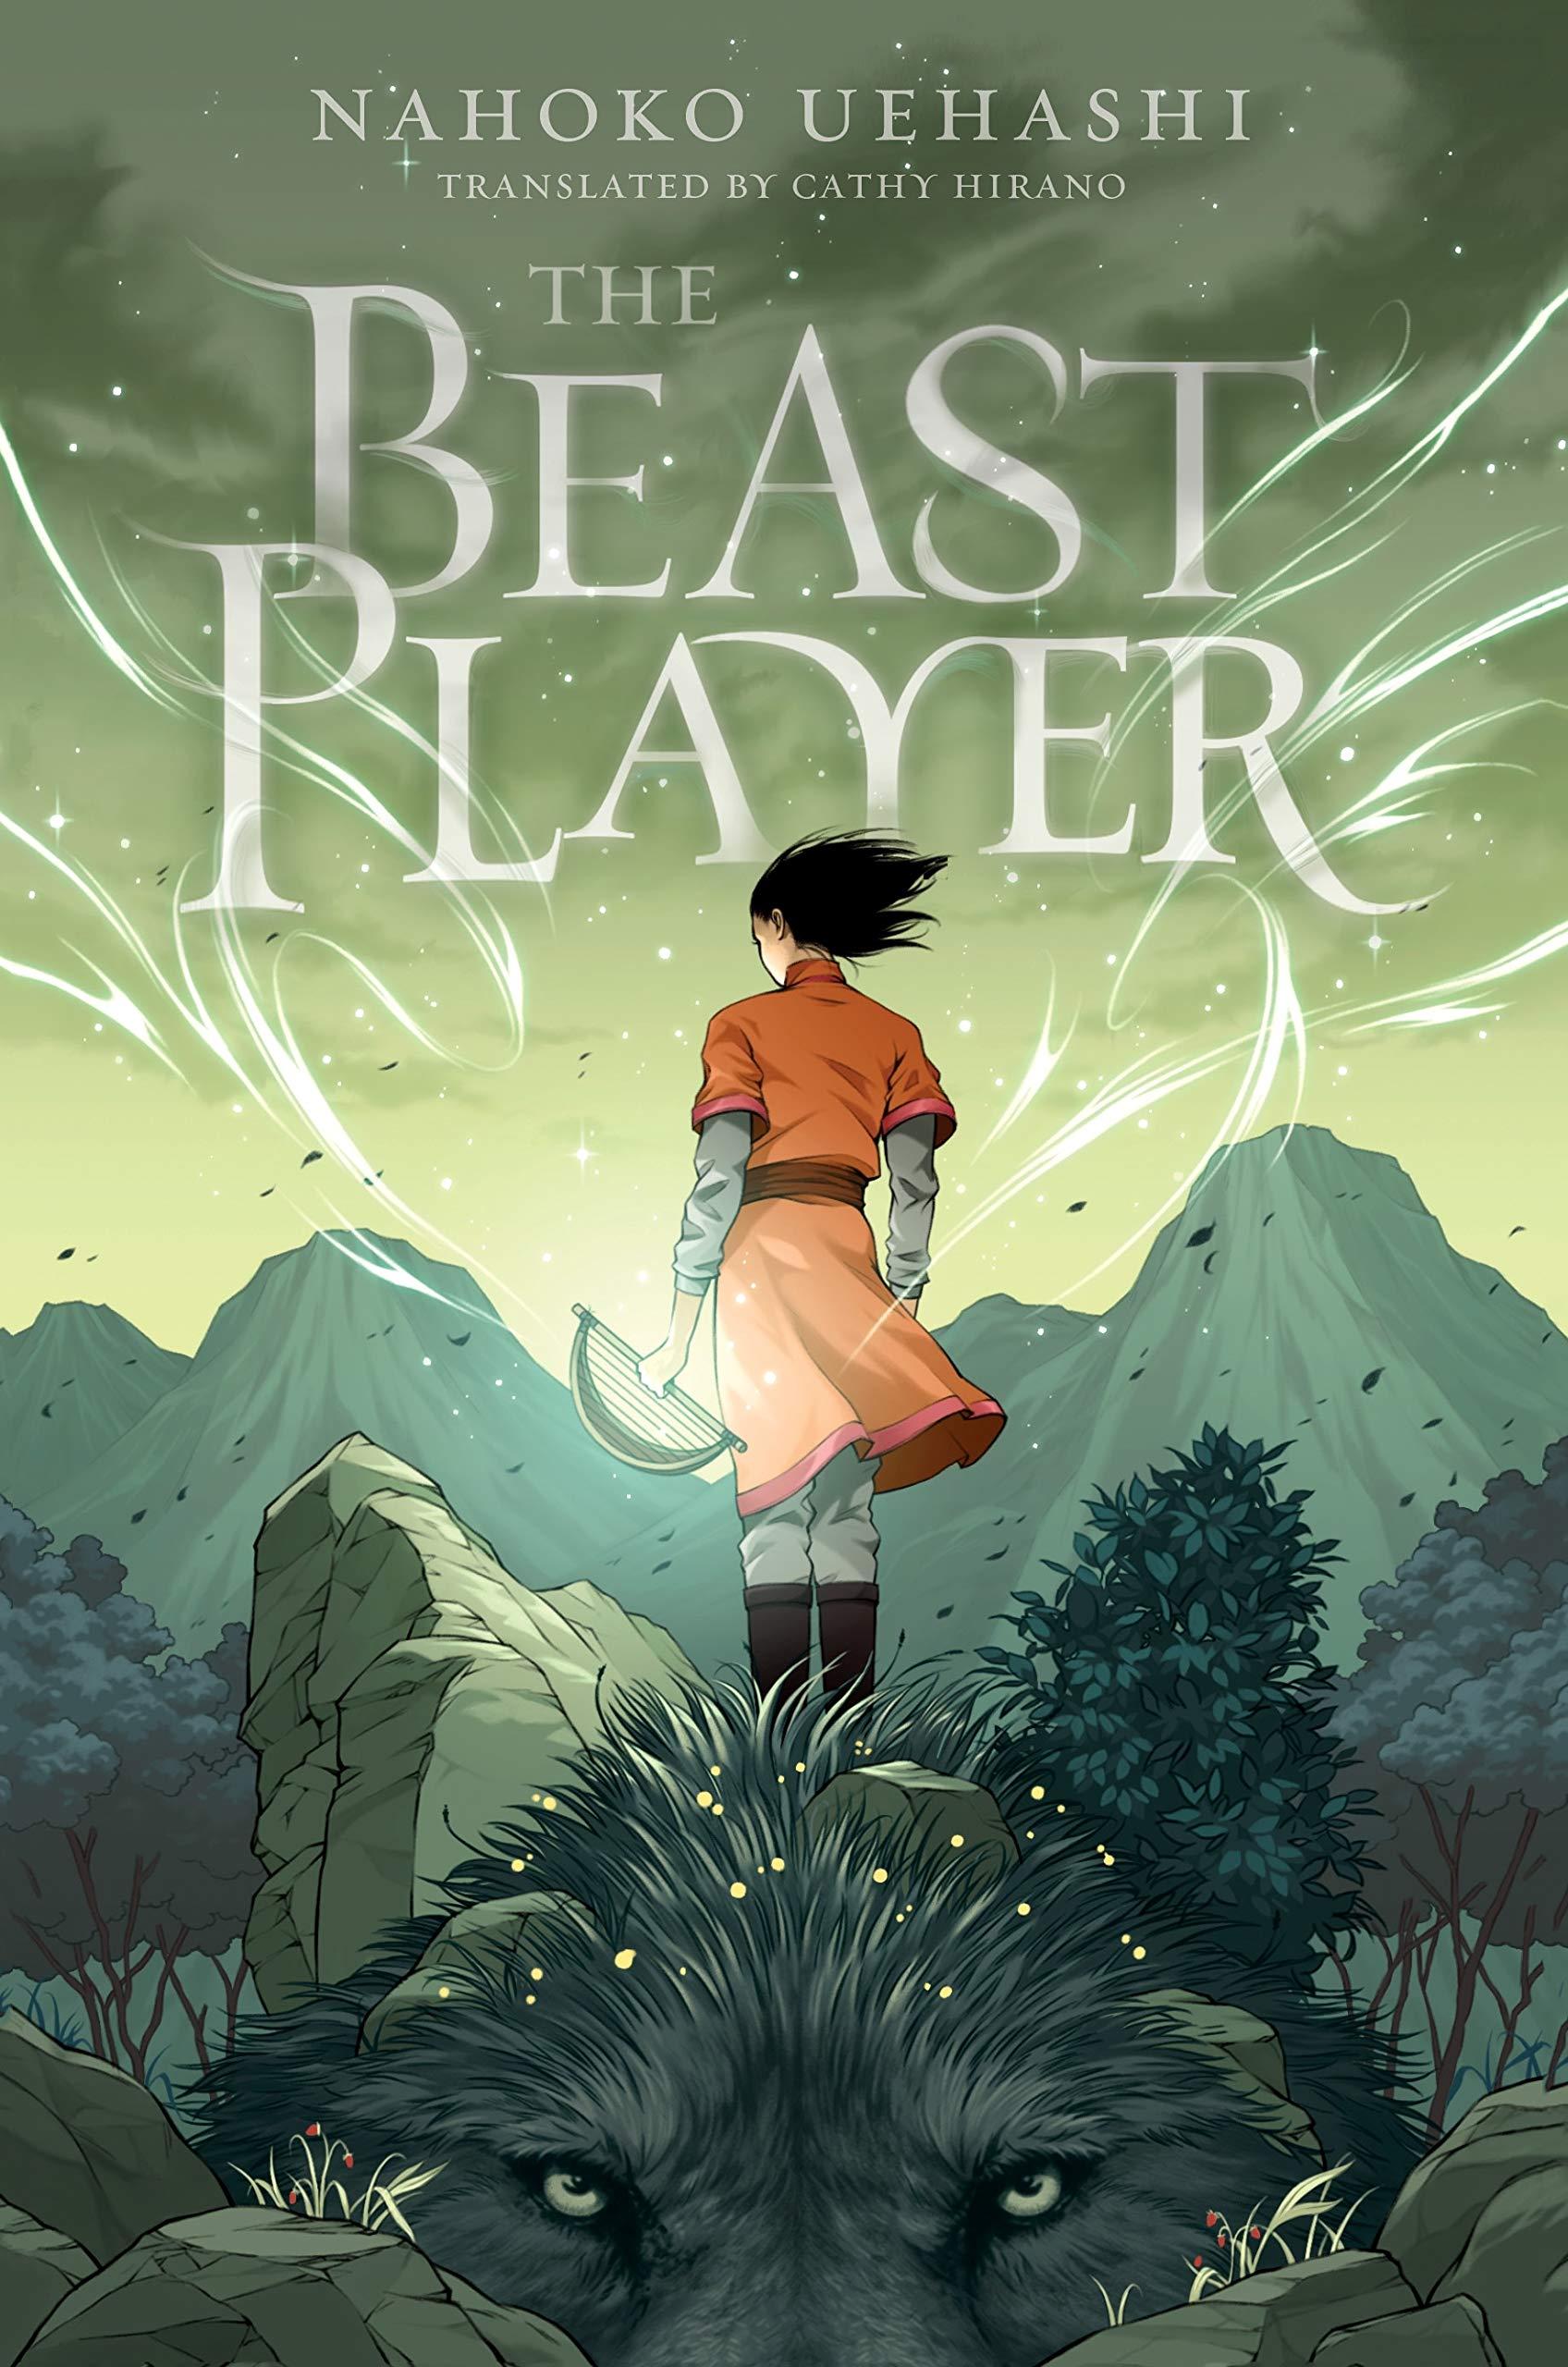 Amazon.com: The Beast Player (9781250307460): Uehashi, Nahoko, Hirano, Cathy: Books